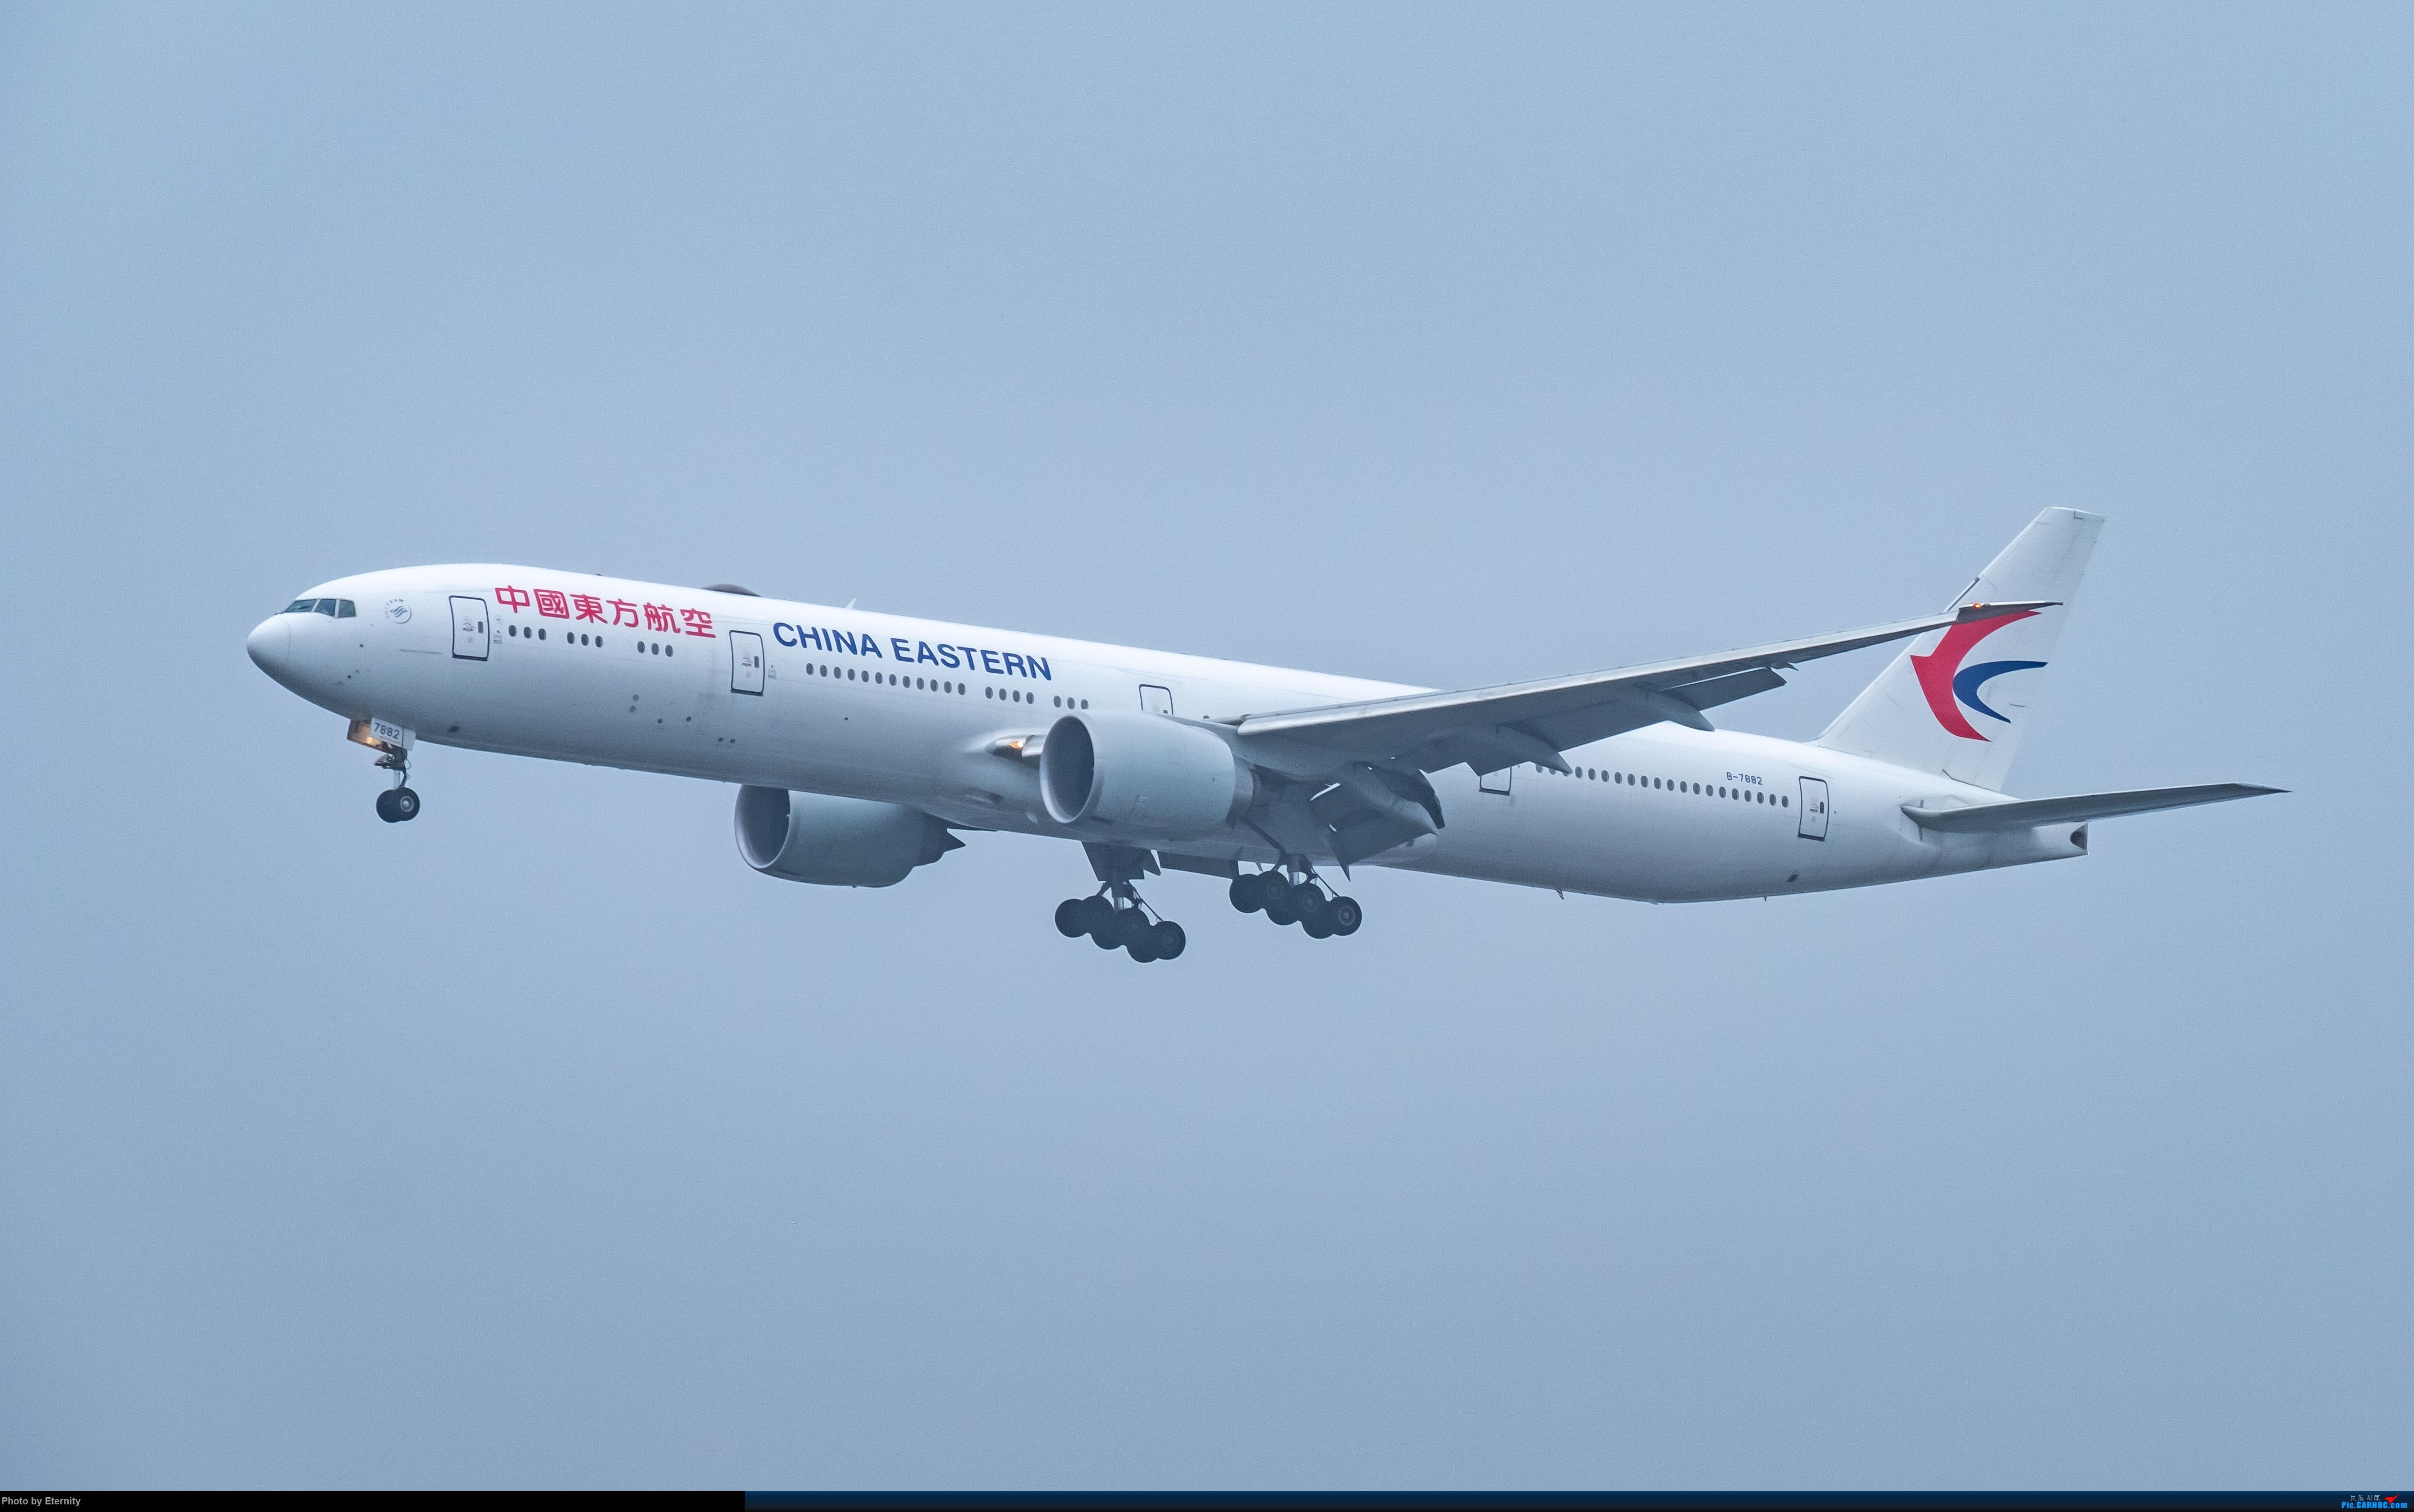 Re:[原创]后疫情期间的暑假国内游 | 西安-上海-广州-成都 | 体验国内3条干线 | 吉祥航空787 | 南航350 | 海航737 BOEING 777-300ER B-7882 中国上海虹桥国际机场